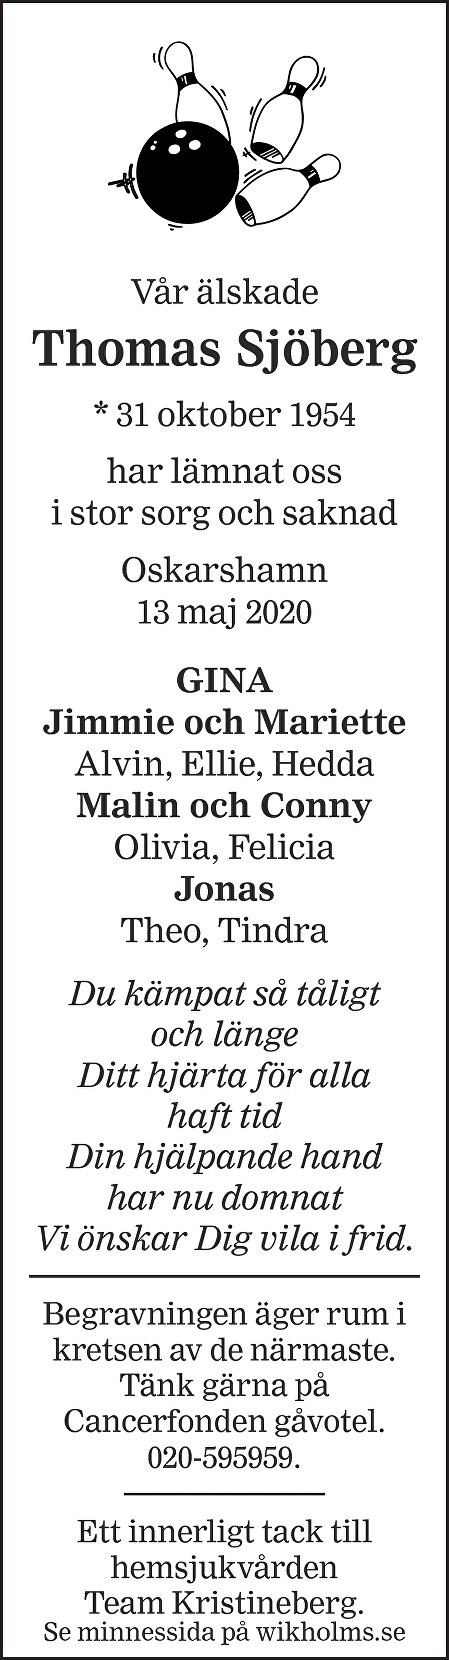 Thomas Sjöberg Death notice